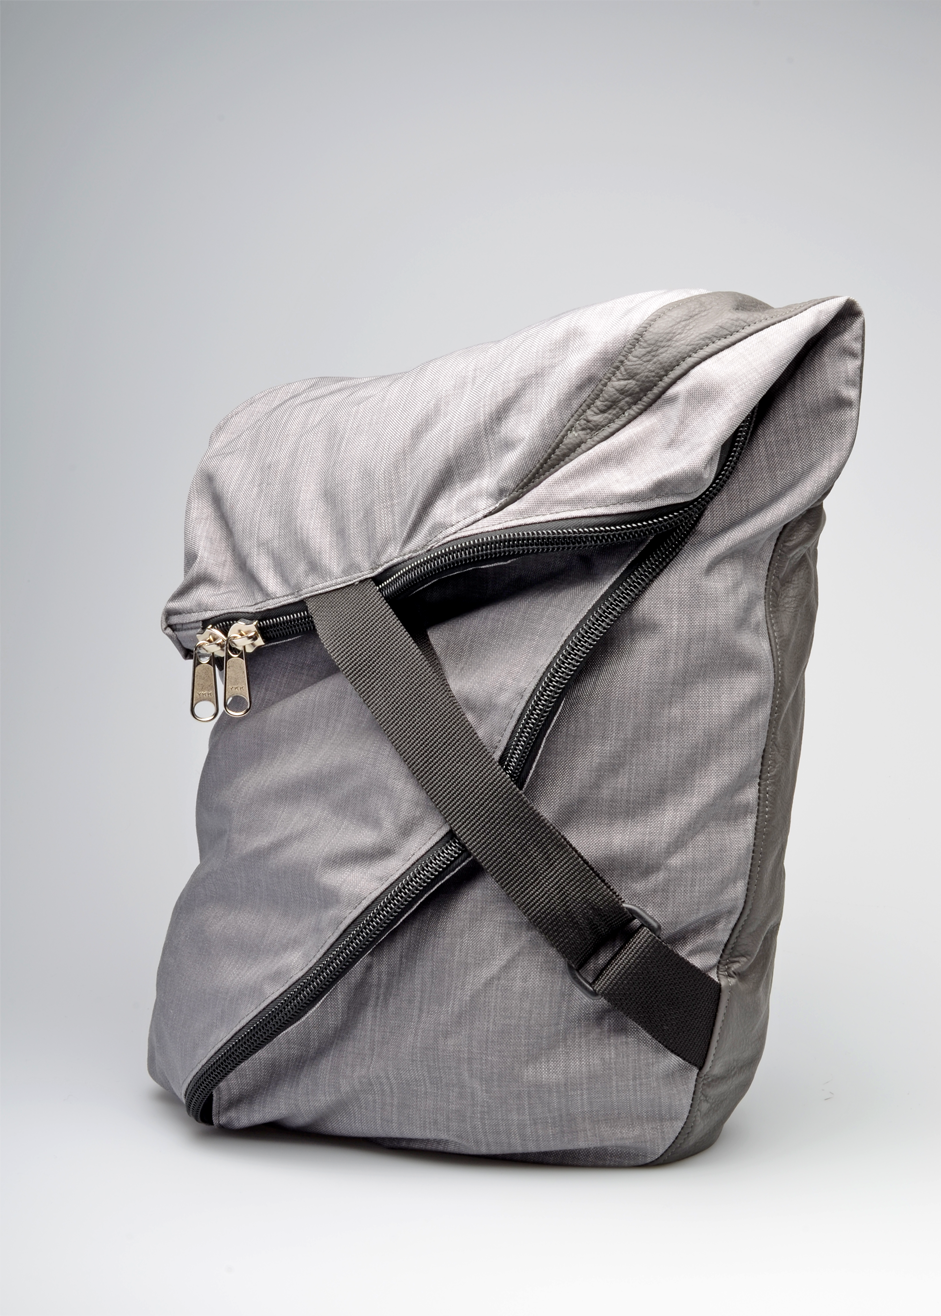 rucksack_2